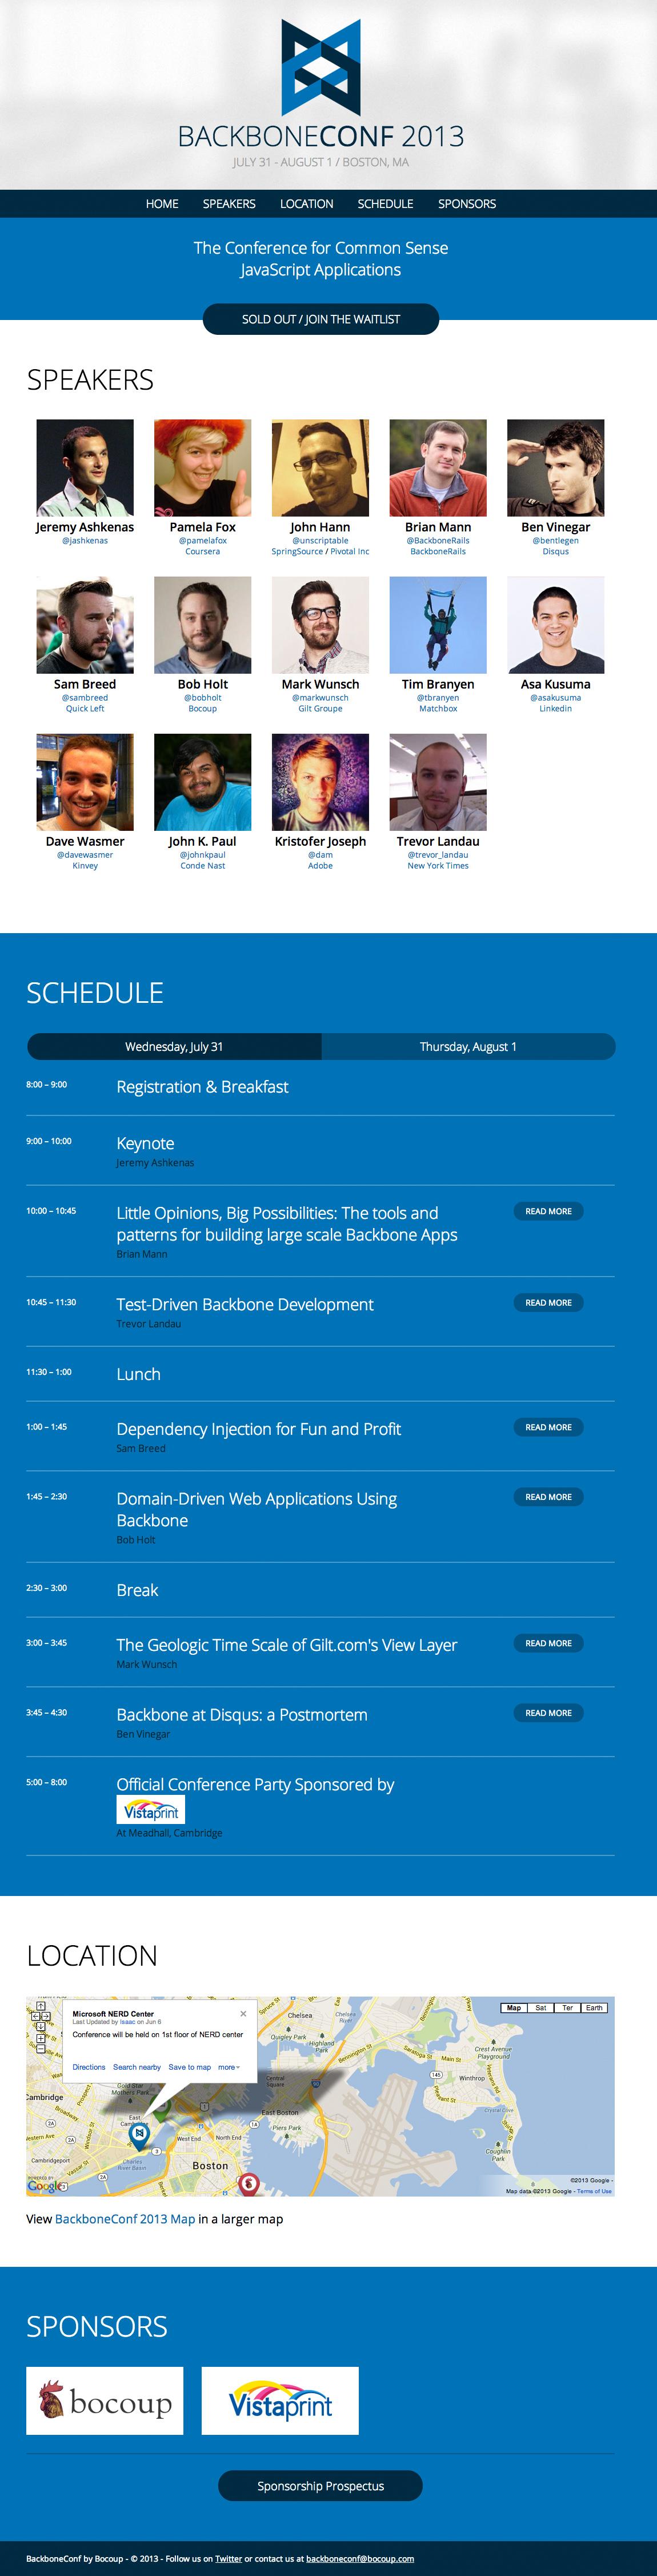 BackboneConf 2013 Website Screenshot